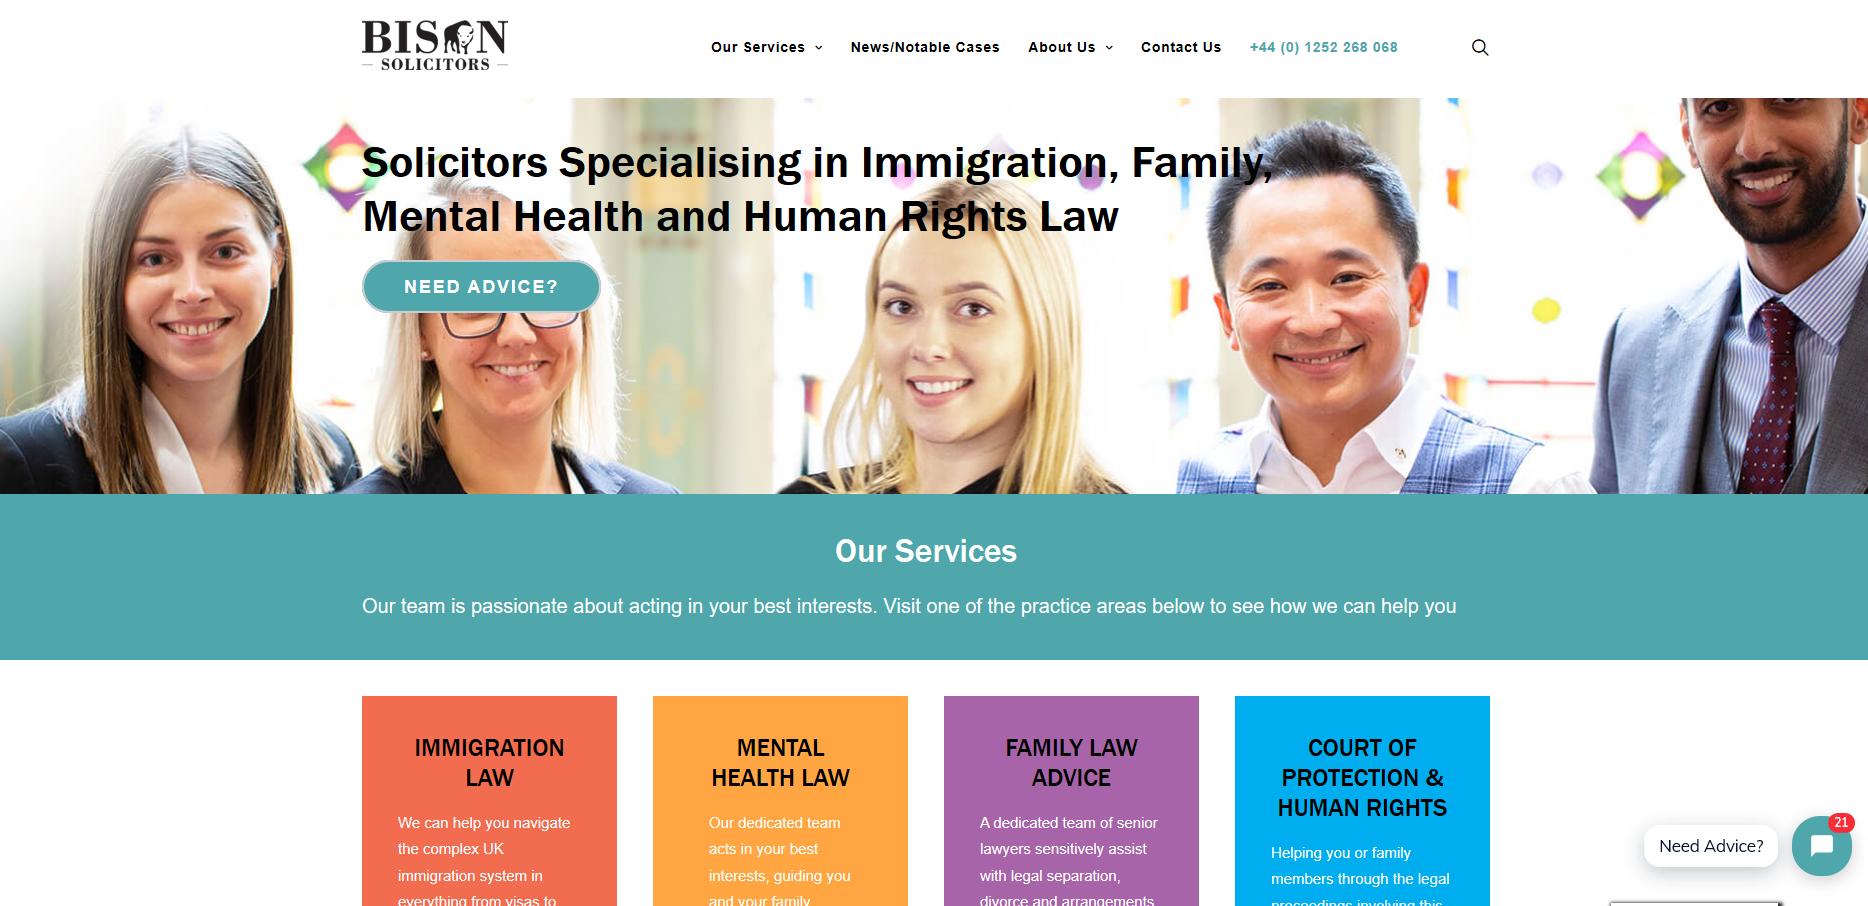 Bison Solicitors home page copy